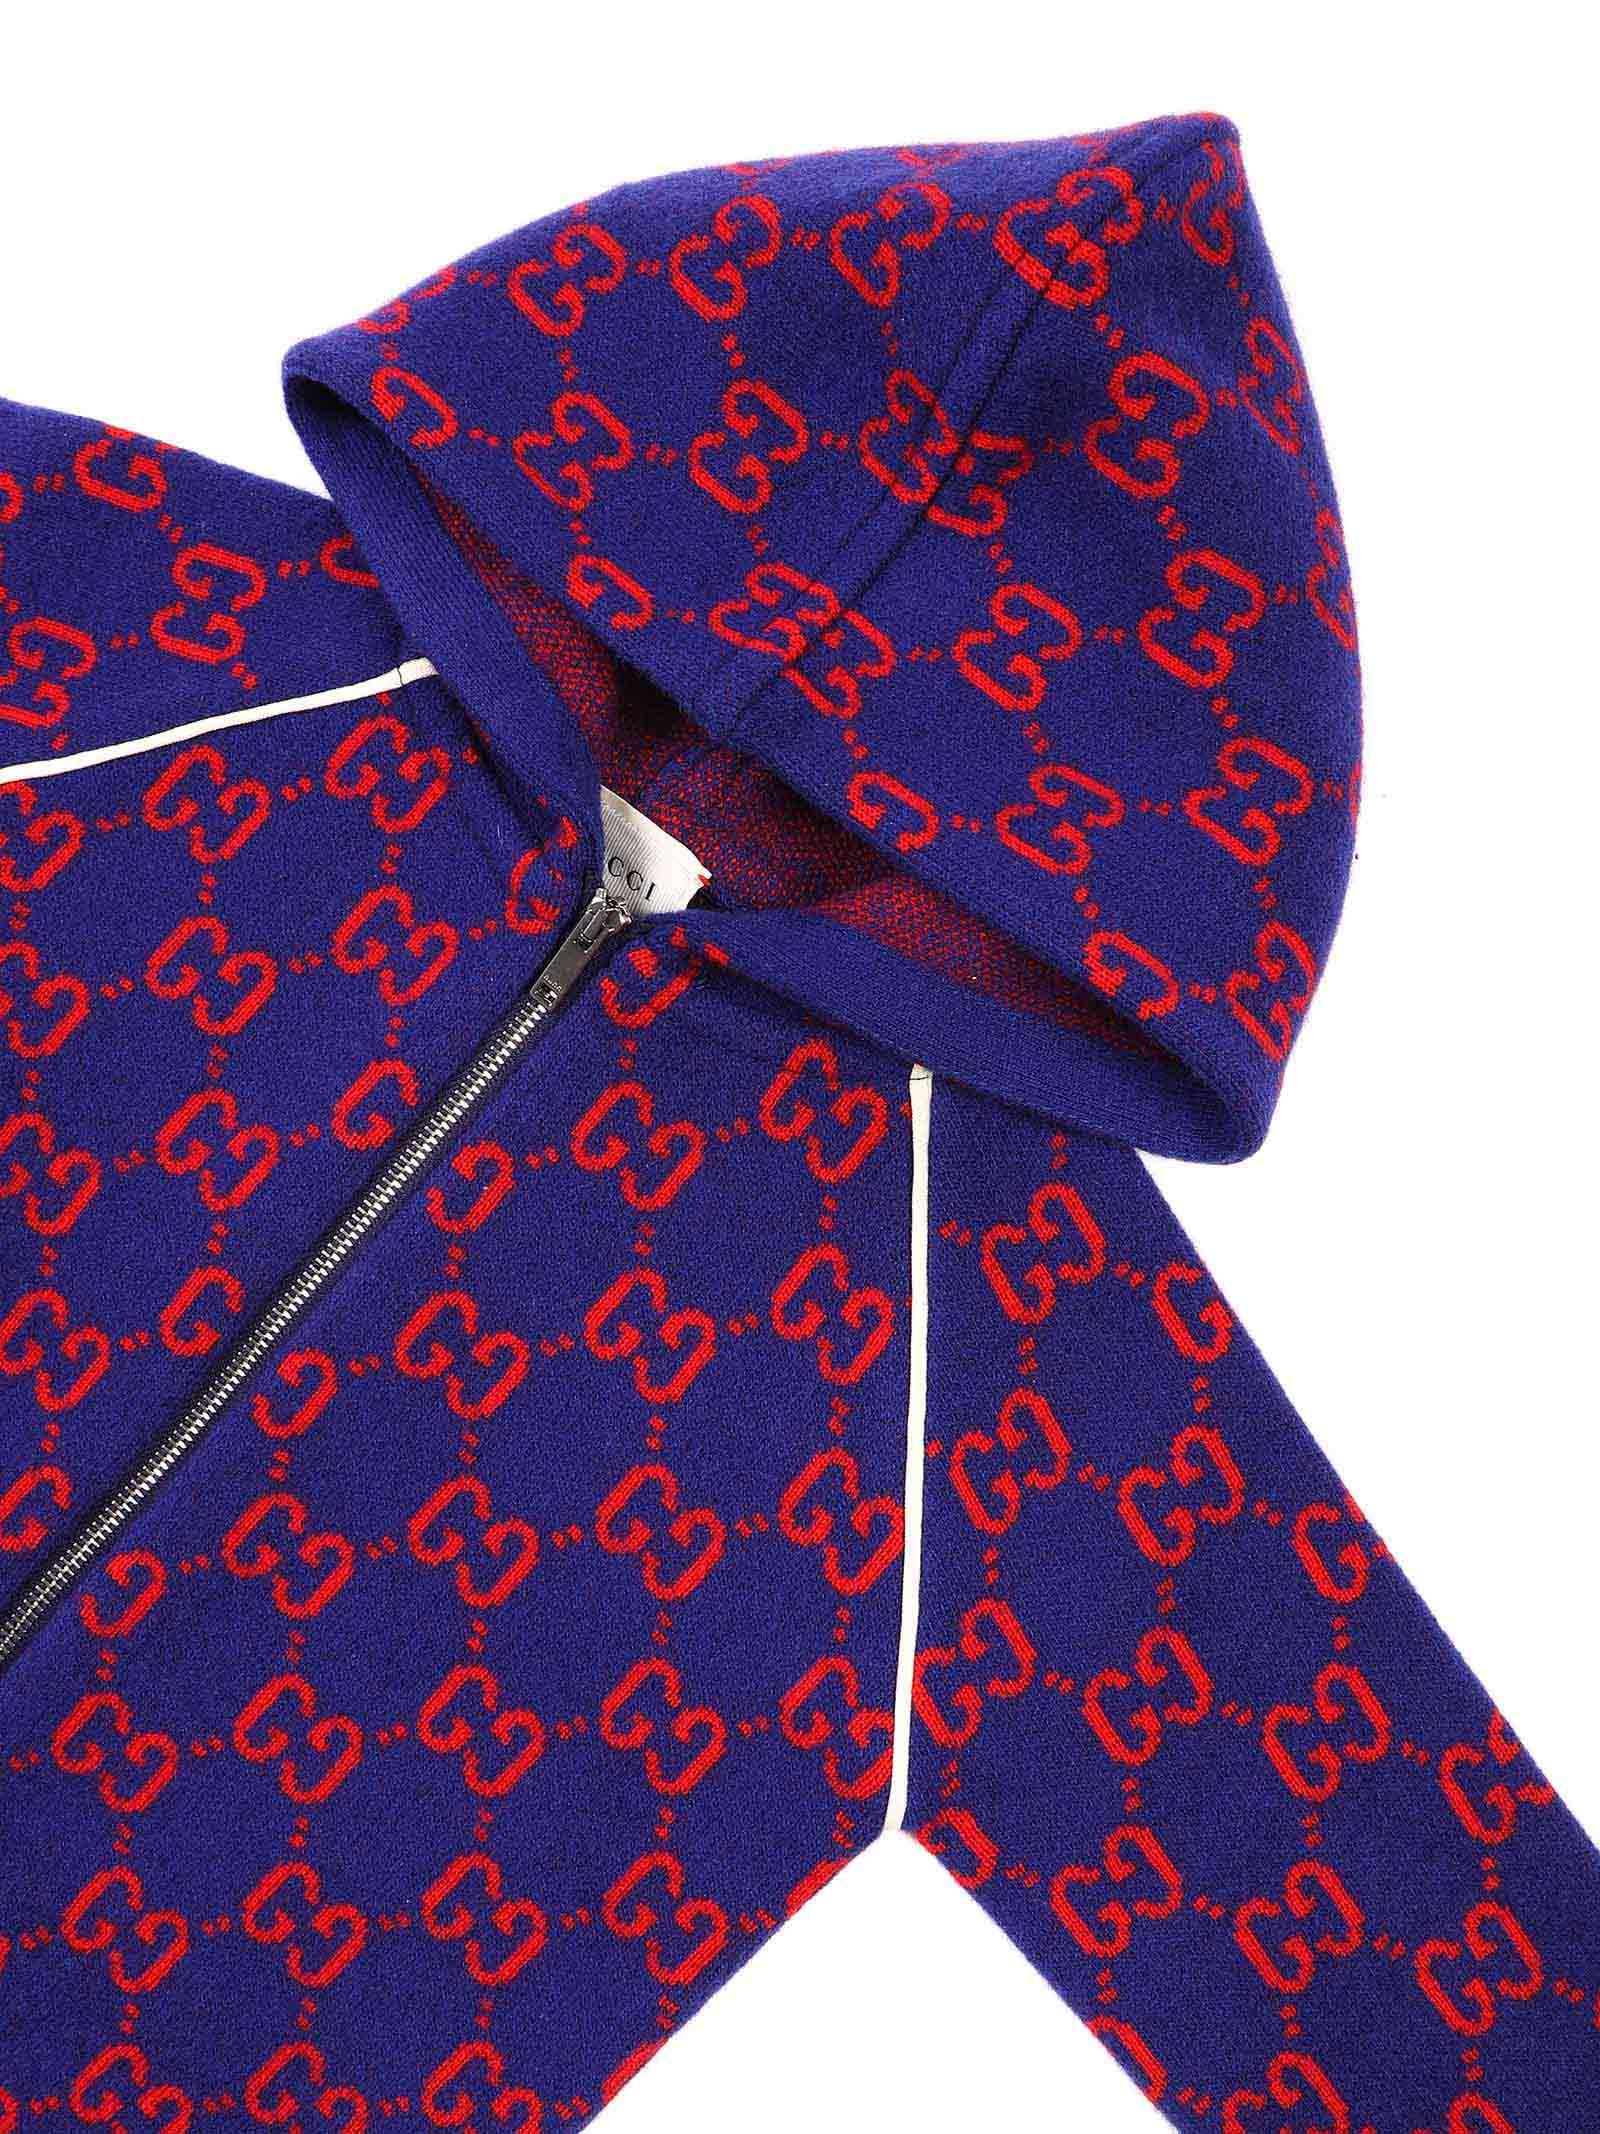 cardigan fondo blu logato rosso Gucci   Cardigan   615412 XKBD74175